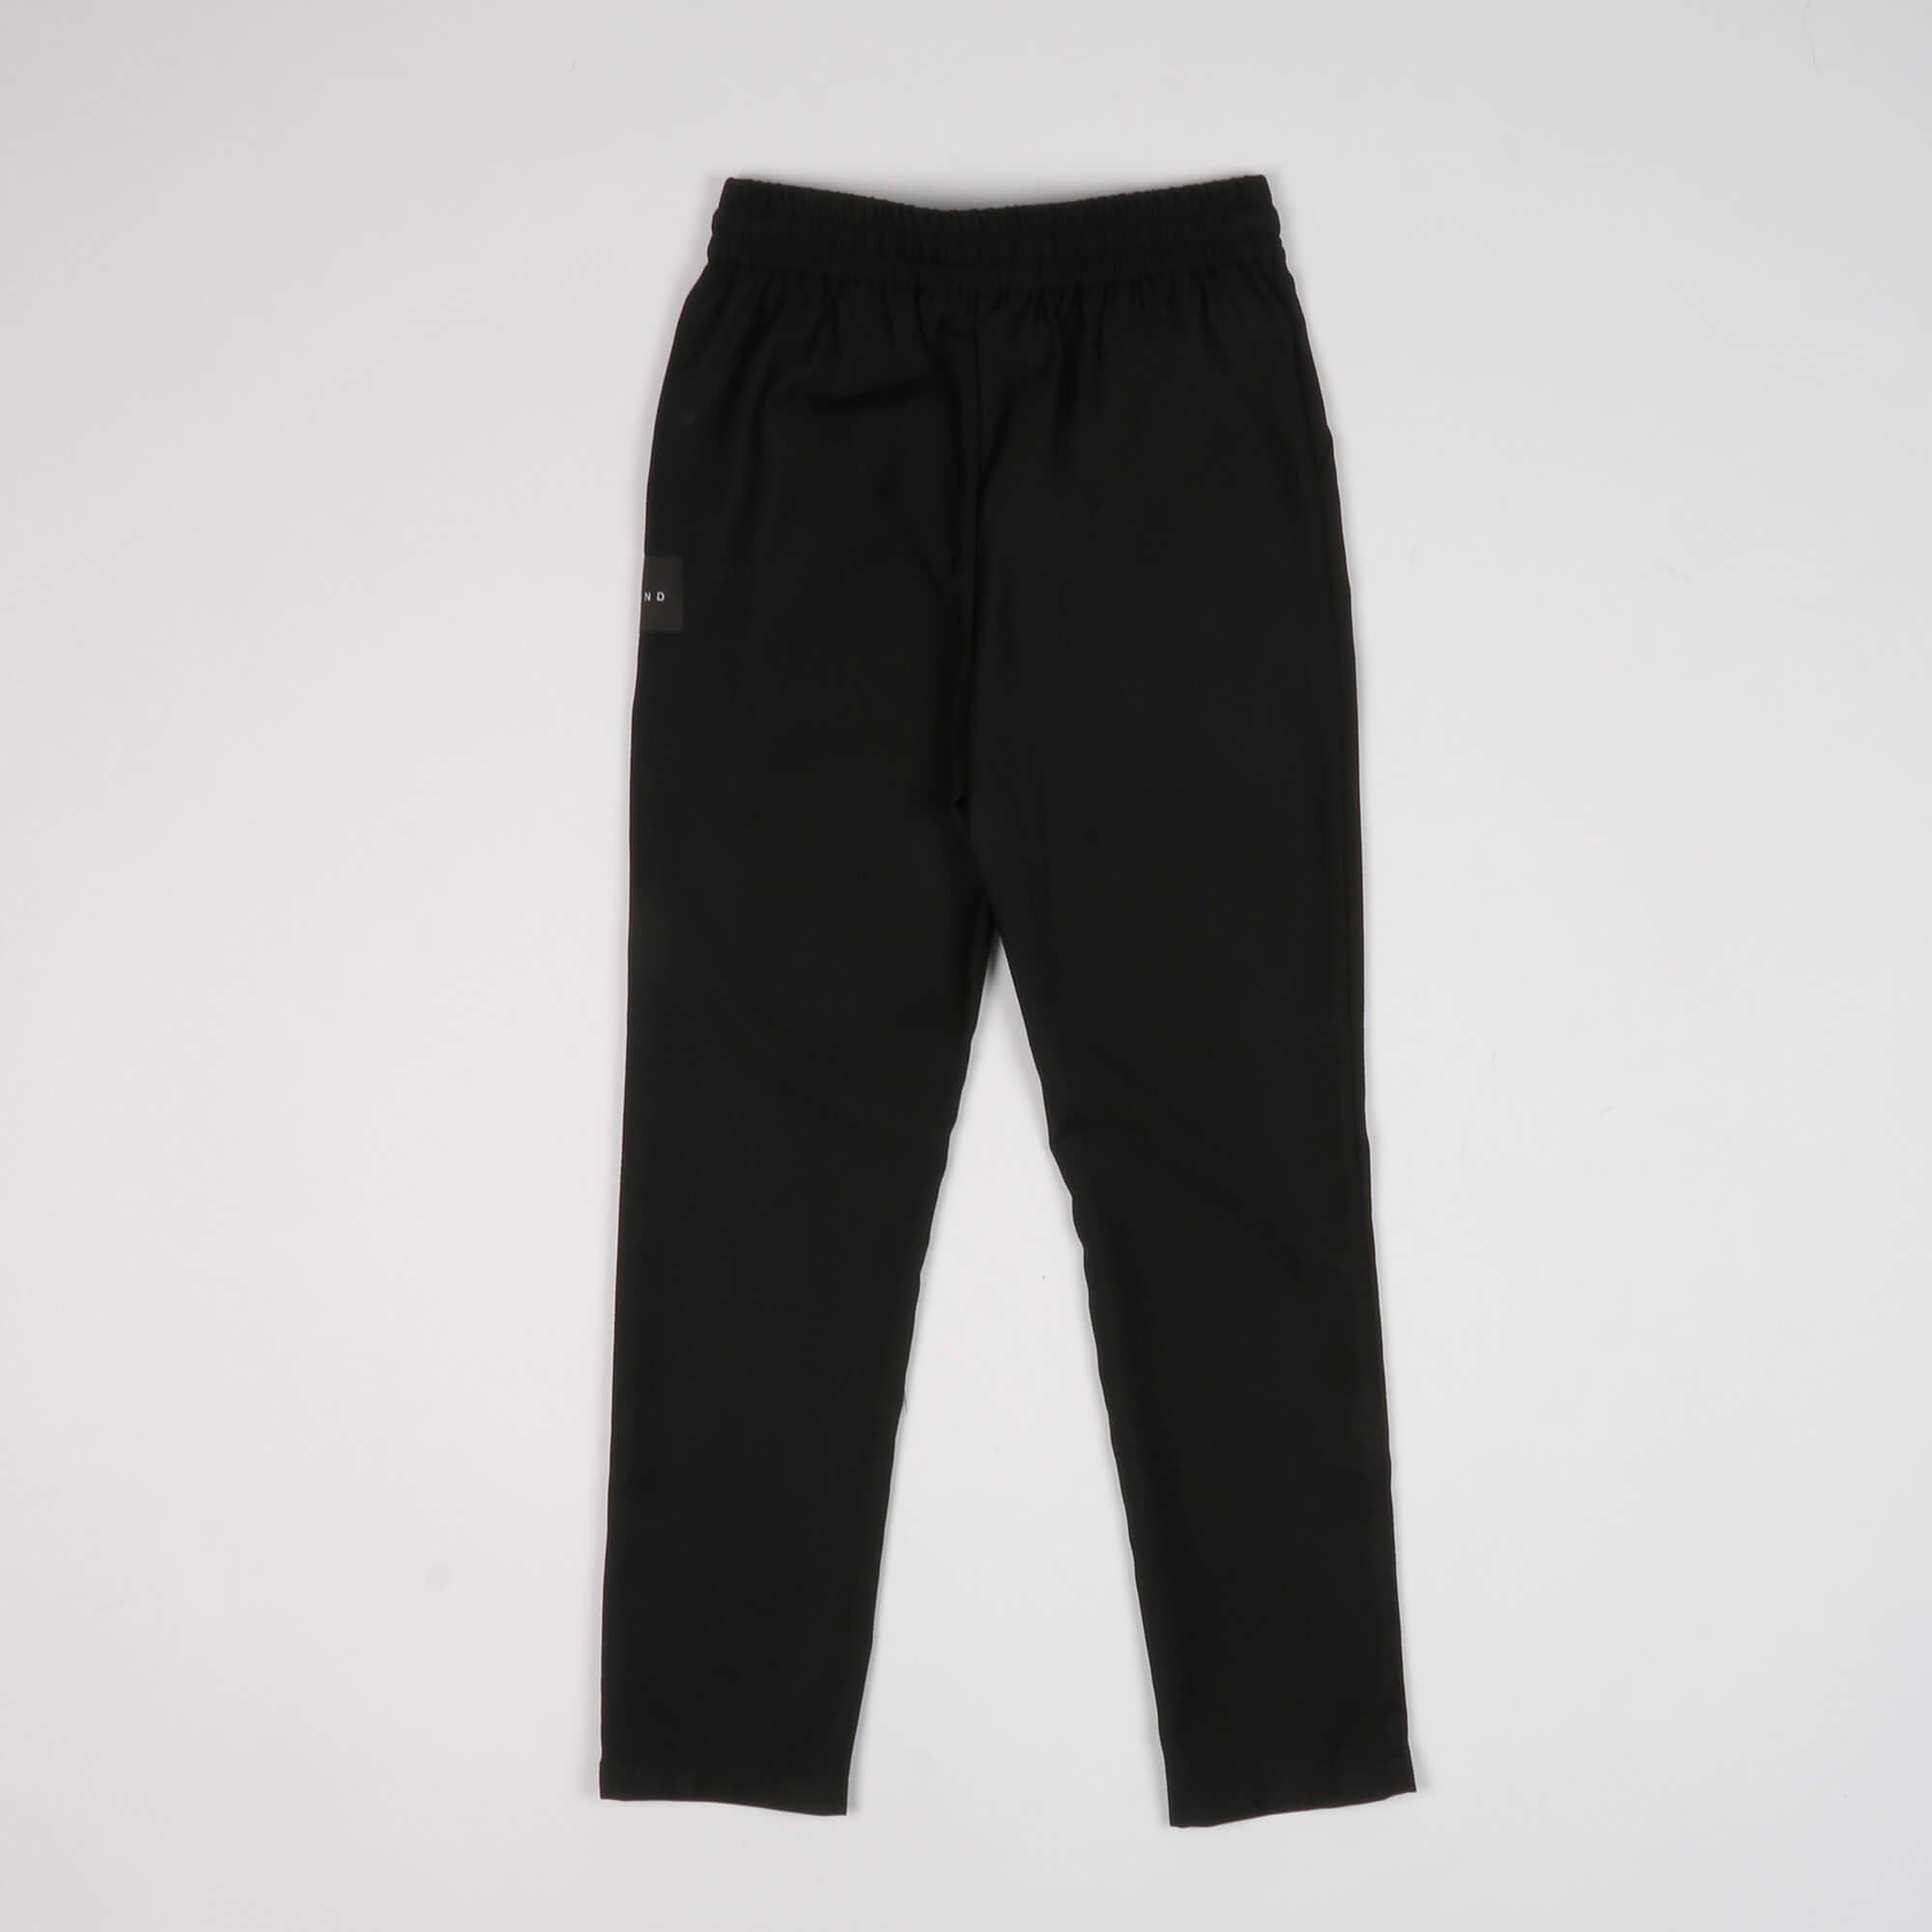 Pantalone etichetta logo - Nero